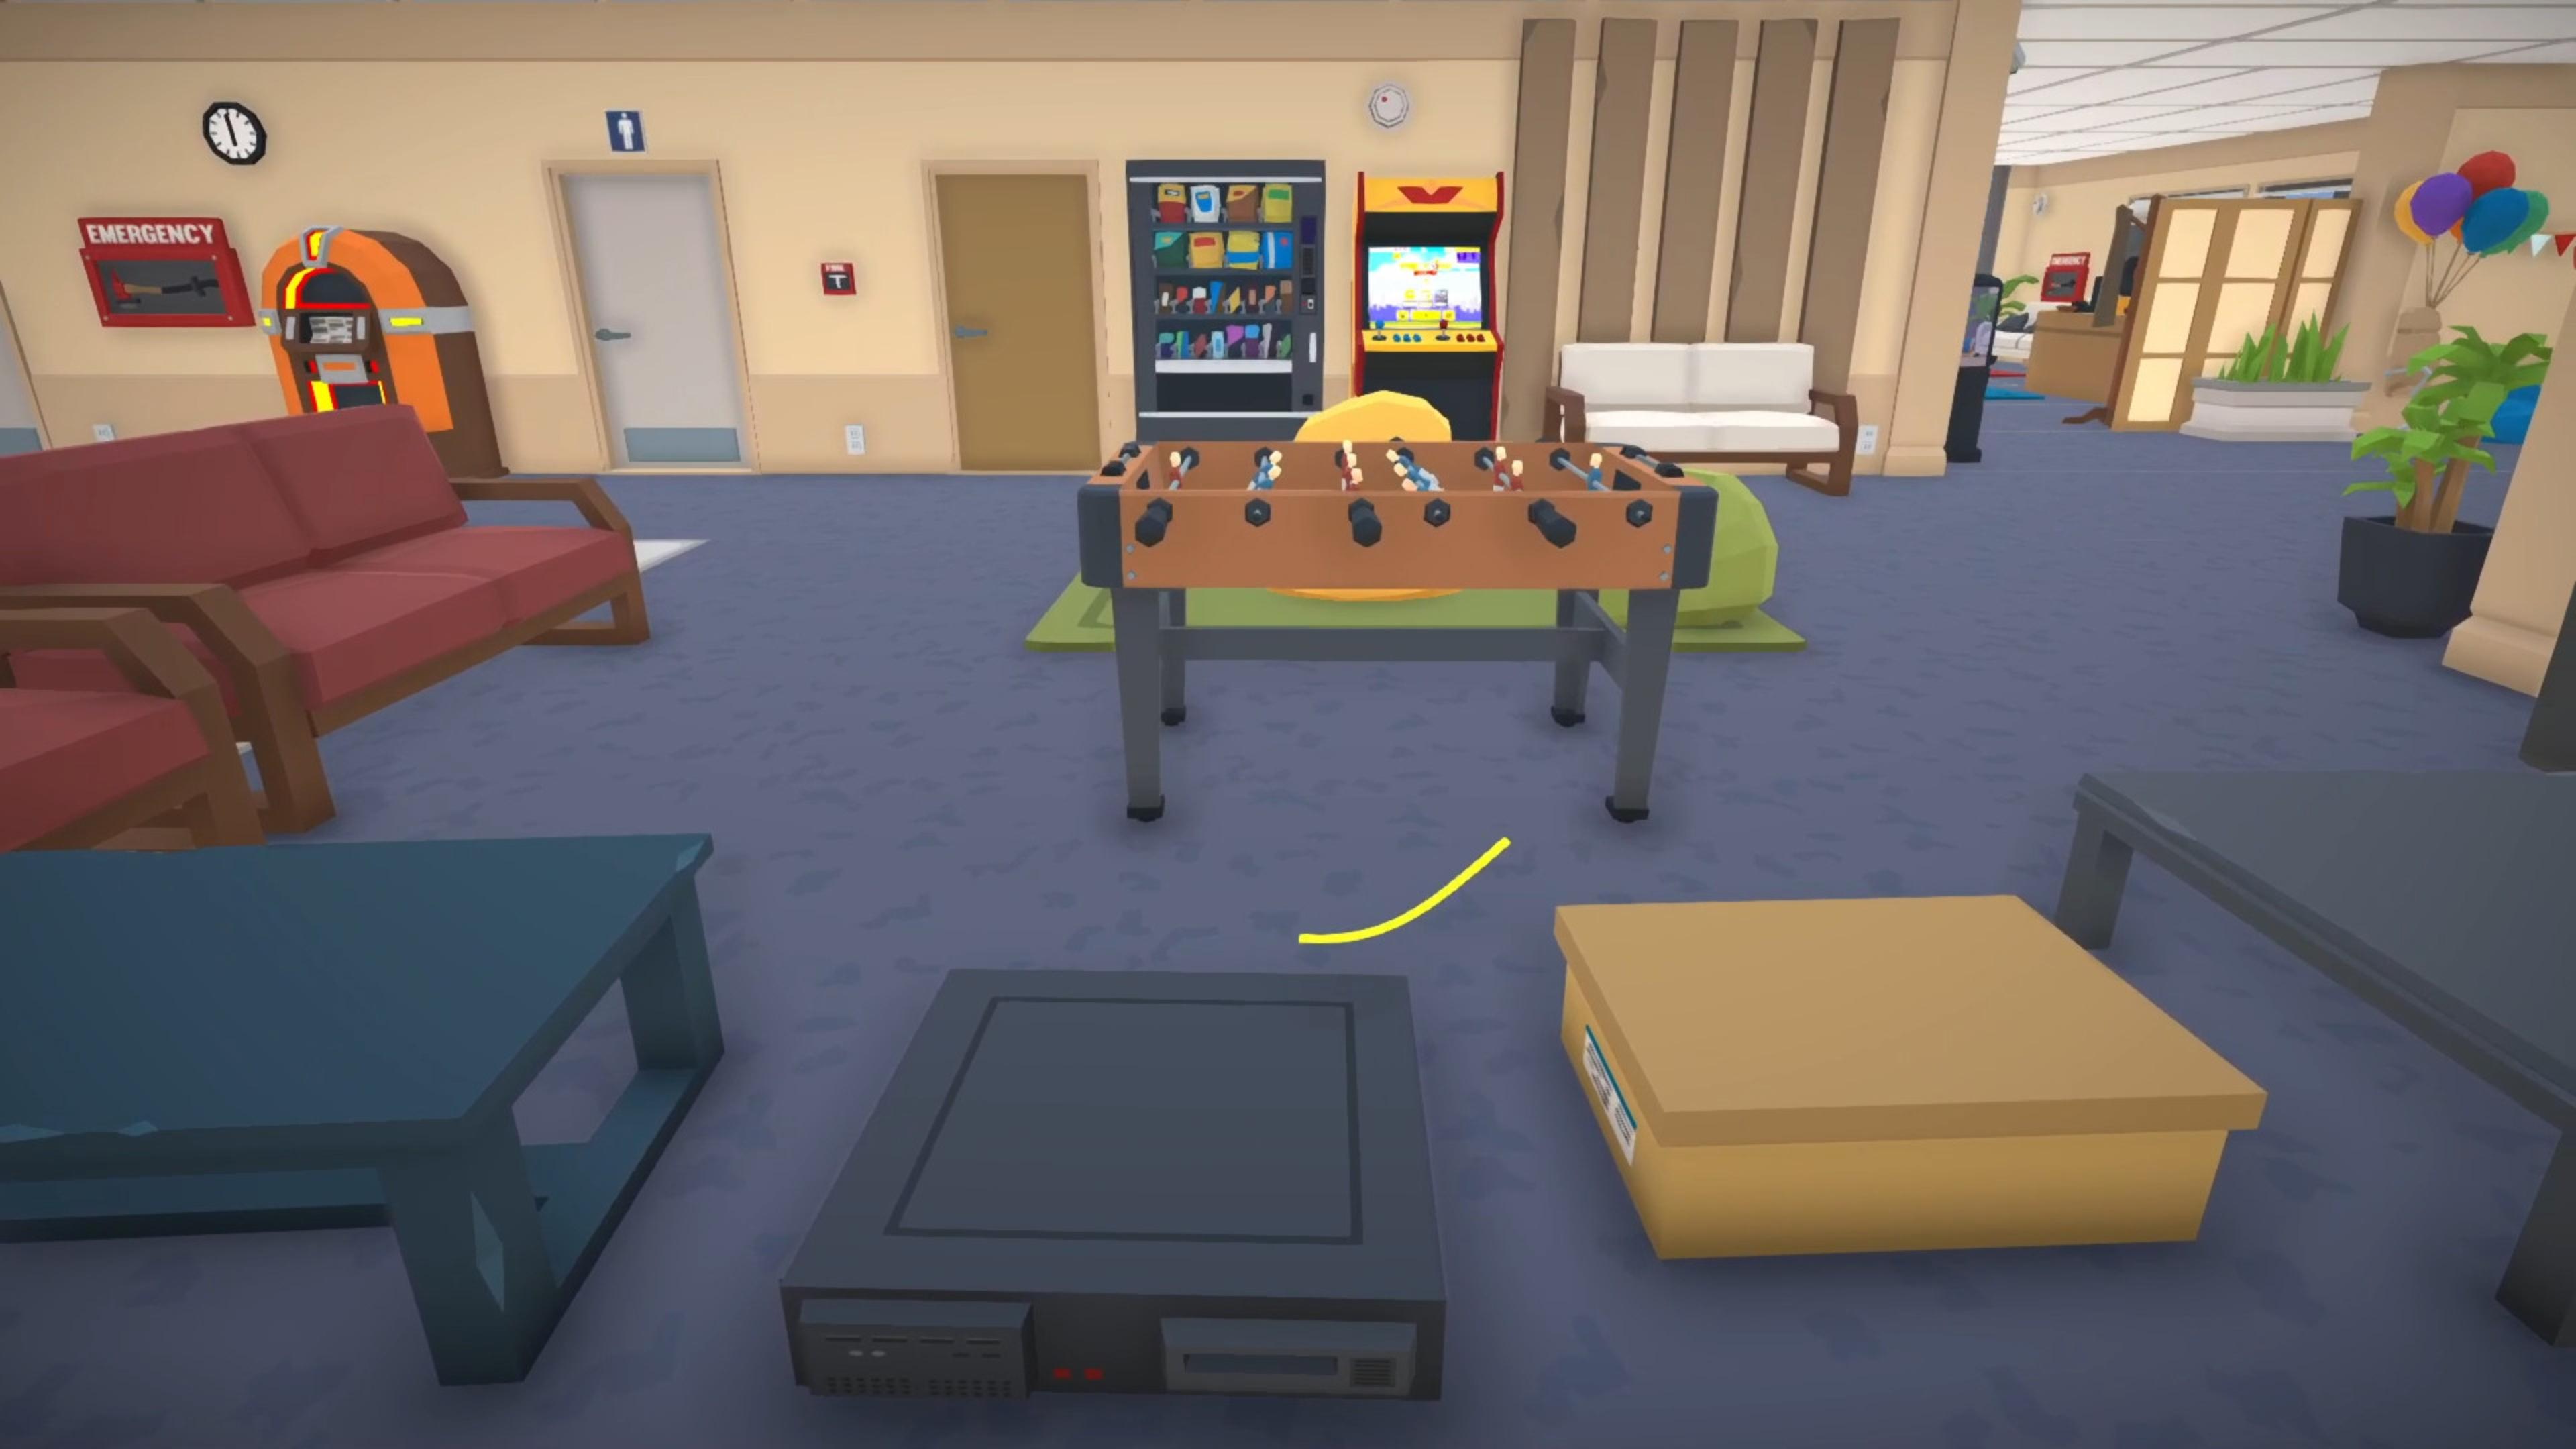 Скриншот №4 к Freddy Spaghetti 2 PS4 and PS5